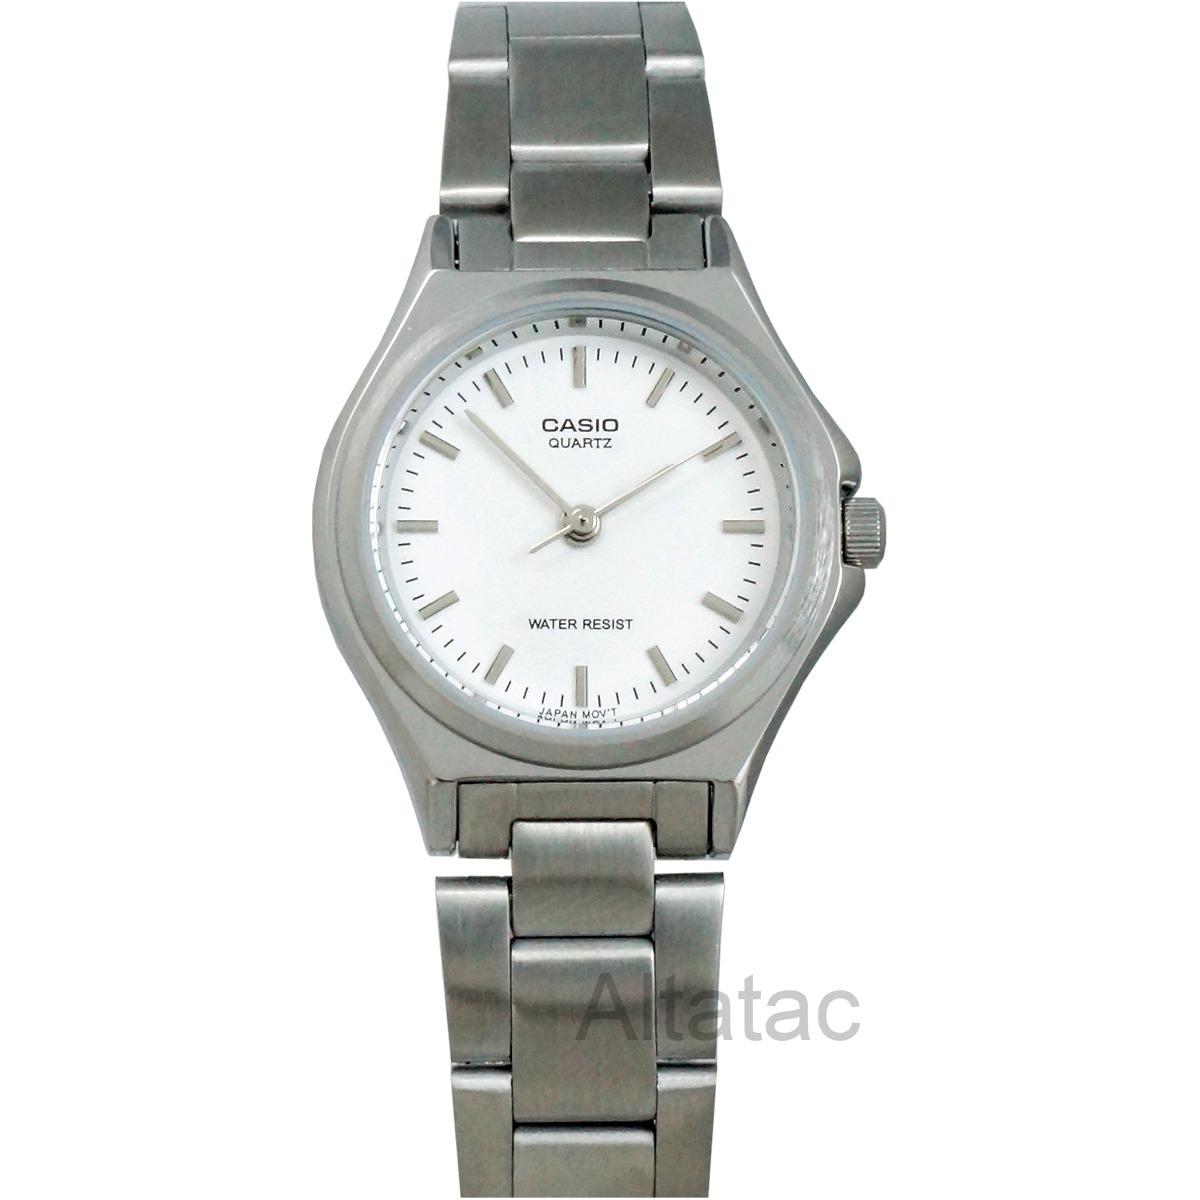 Características. Marca Casio  Modelo LTP-1130A  Género Dama  Material de la  correa del reloj pulsera Acero inoxidable ... efd2ac1f7a5a